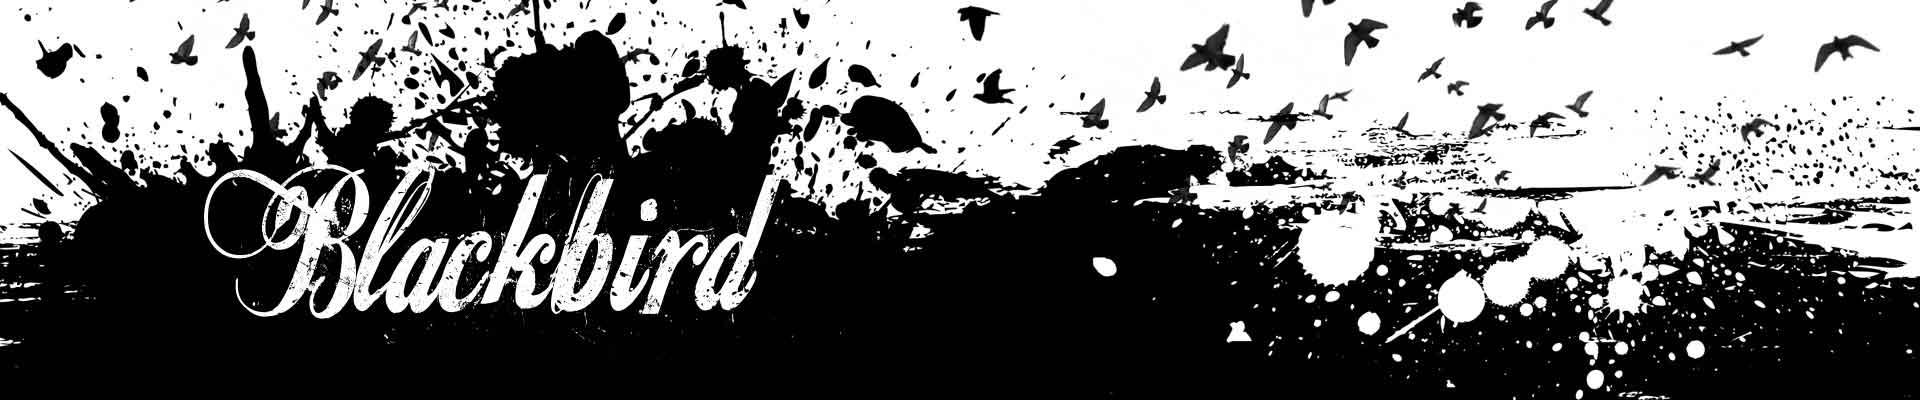 blackbird eb's climbing shoe